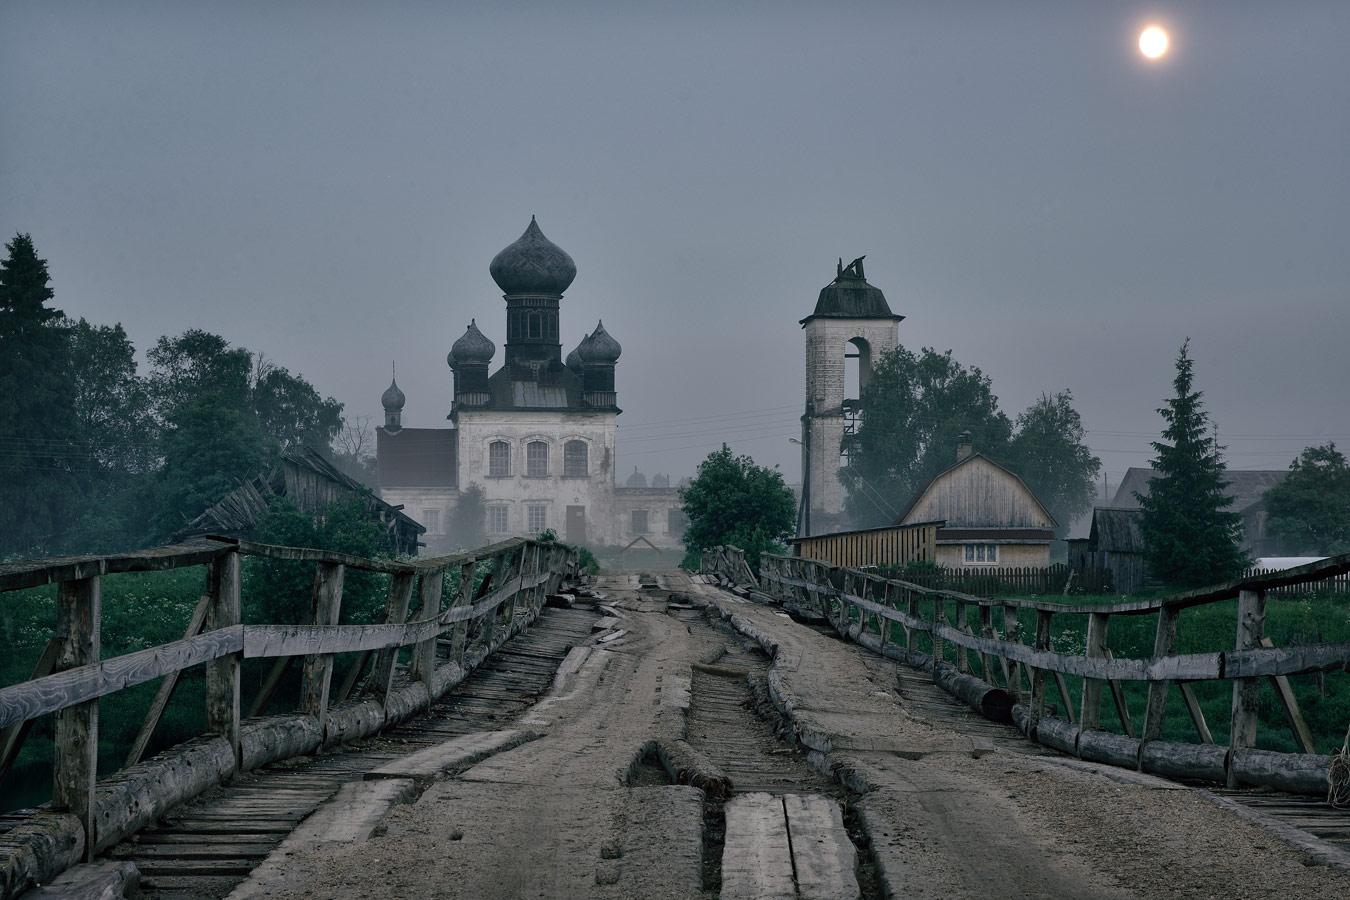 © Mikhail Prokhorov, 8th place, Wiki Loves Monuments Photo Contest